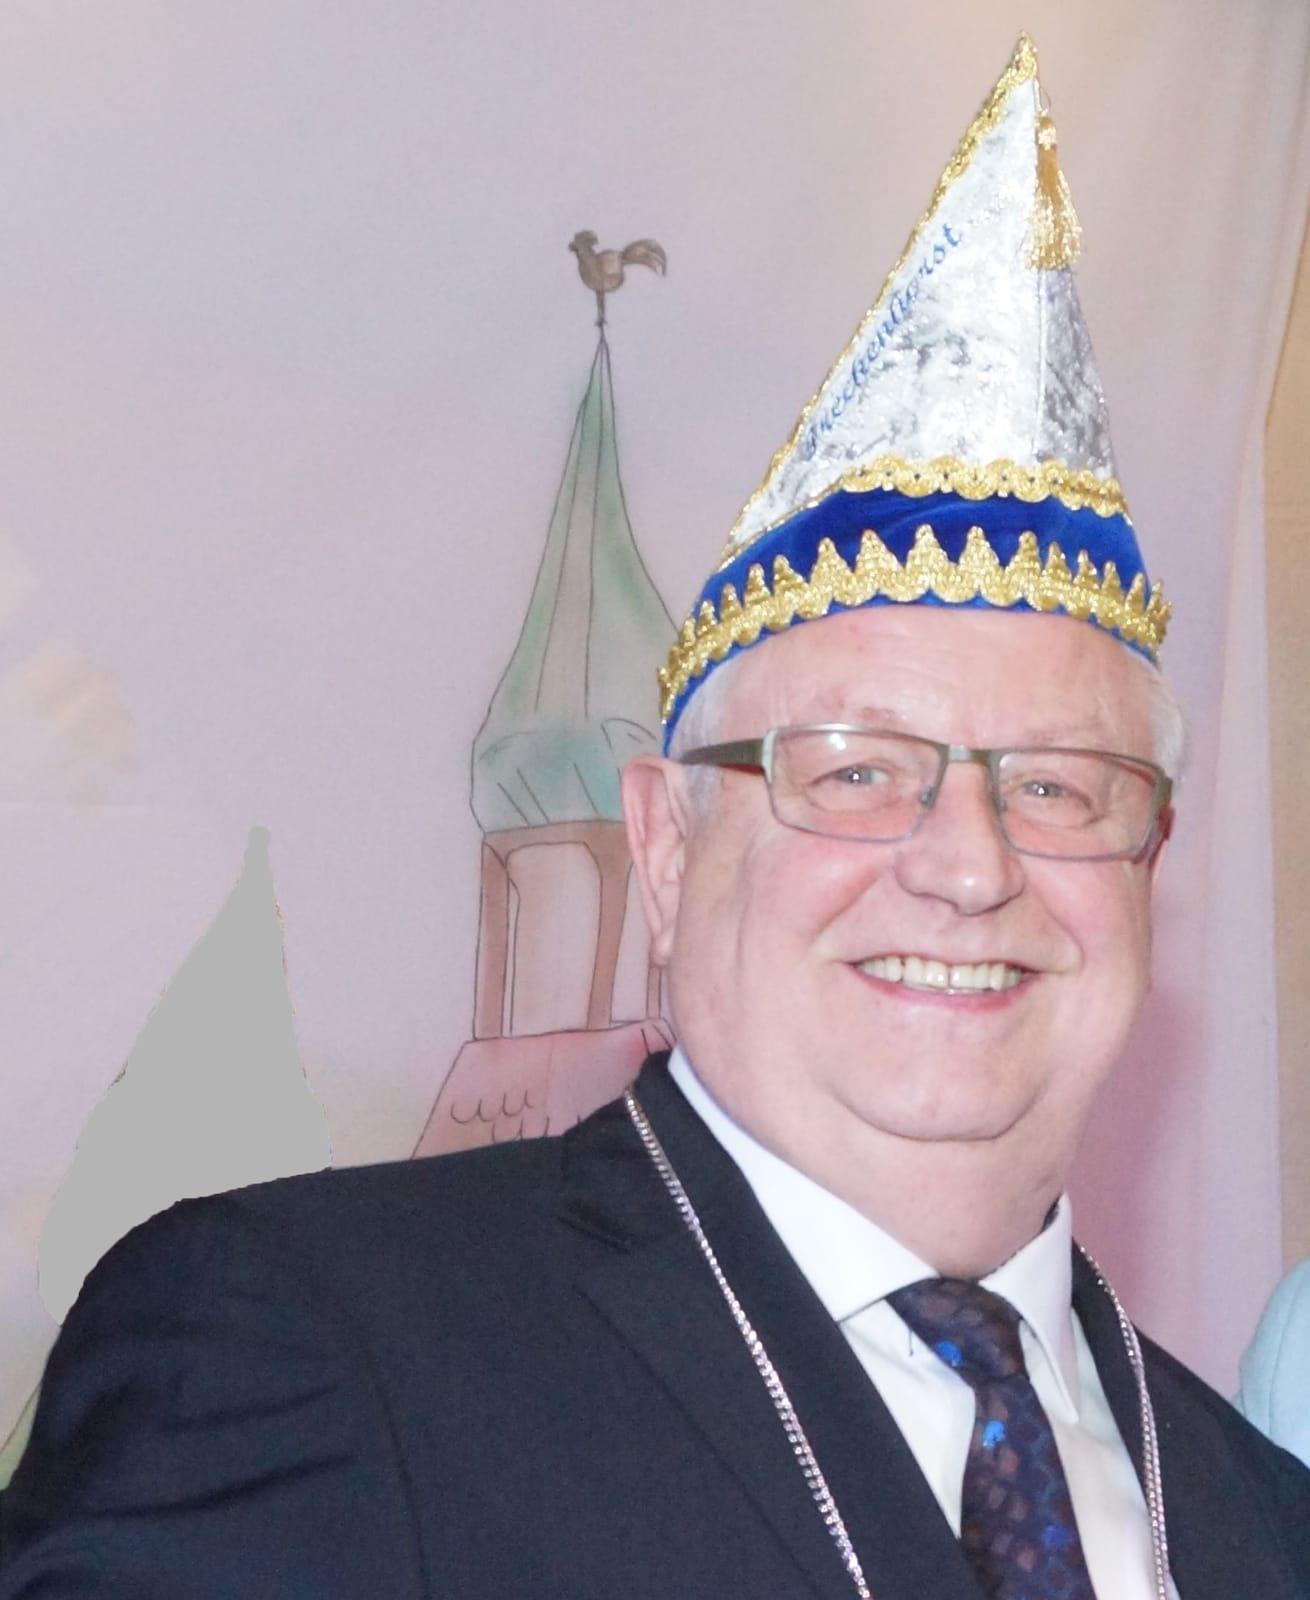 Jürgen Dufhues